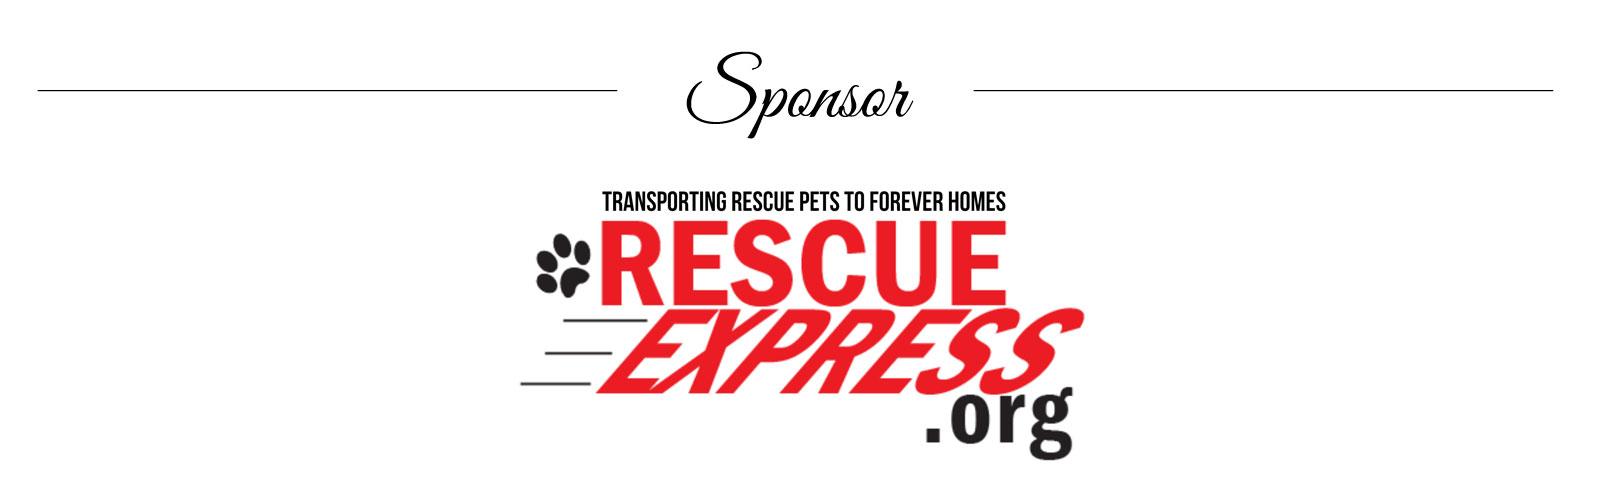 Sponsor-rescueExpress